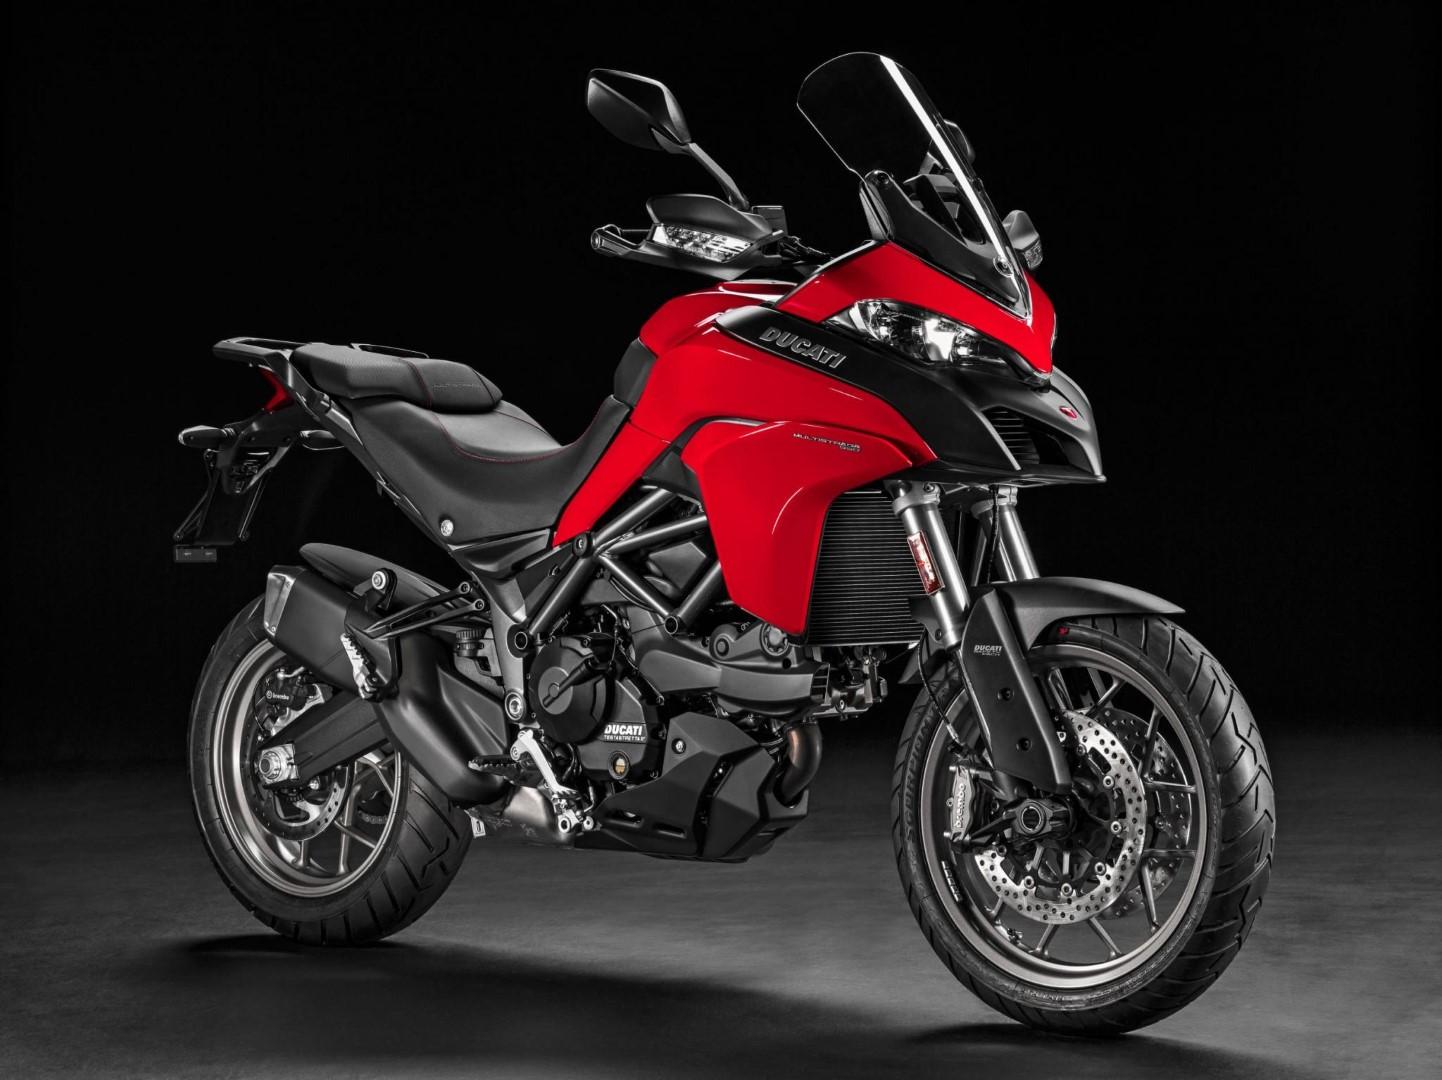 Ducati Multistrada 950 2017 fotos